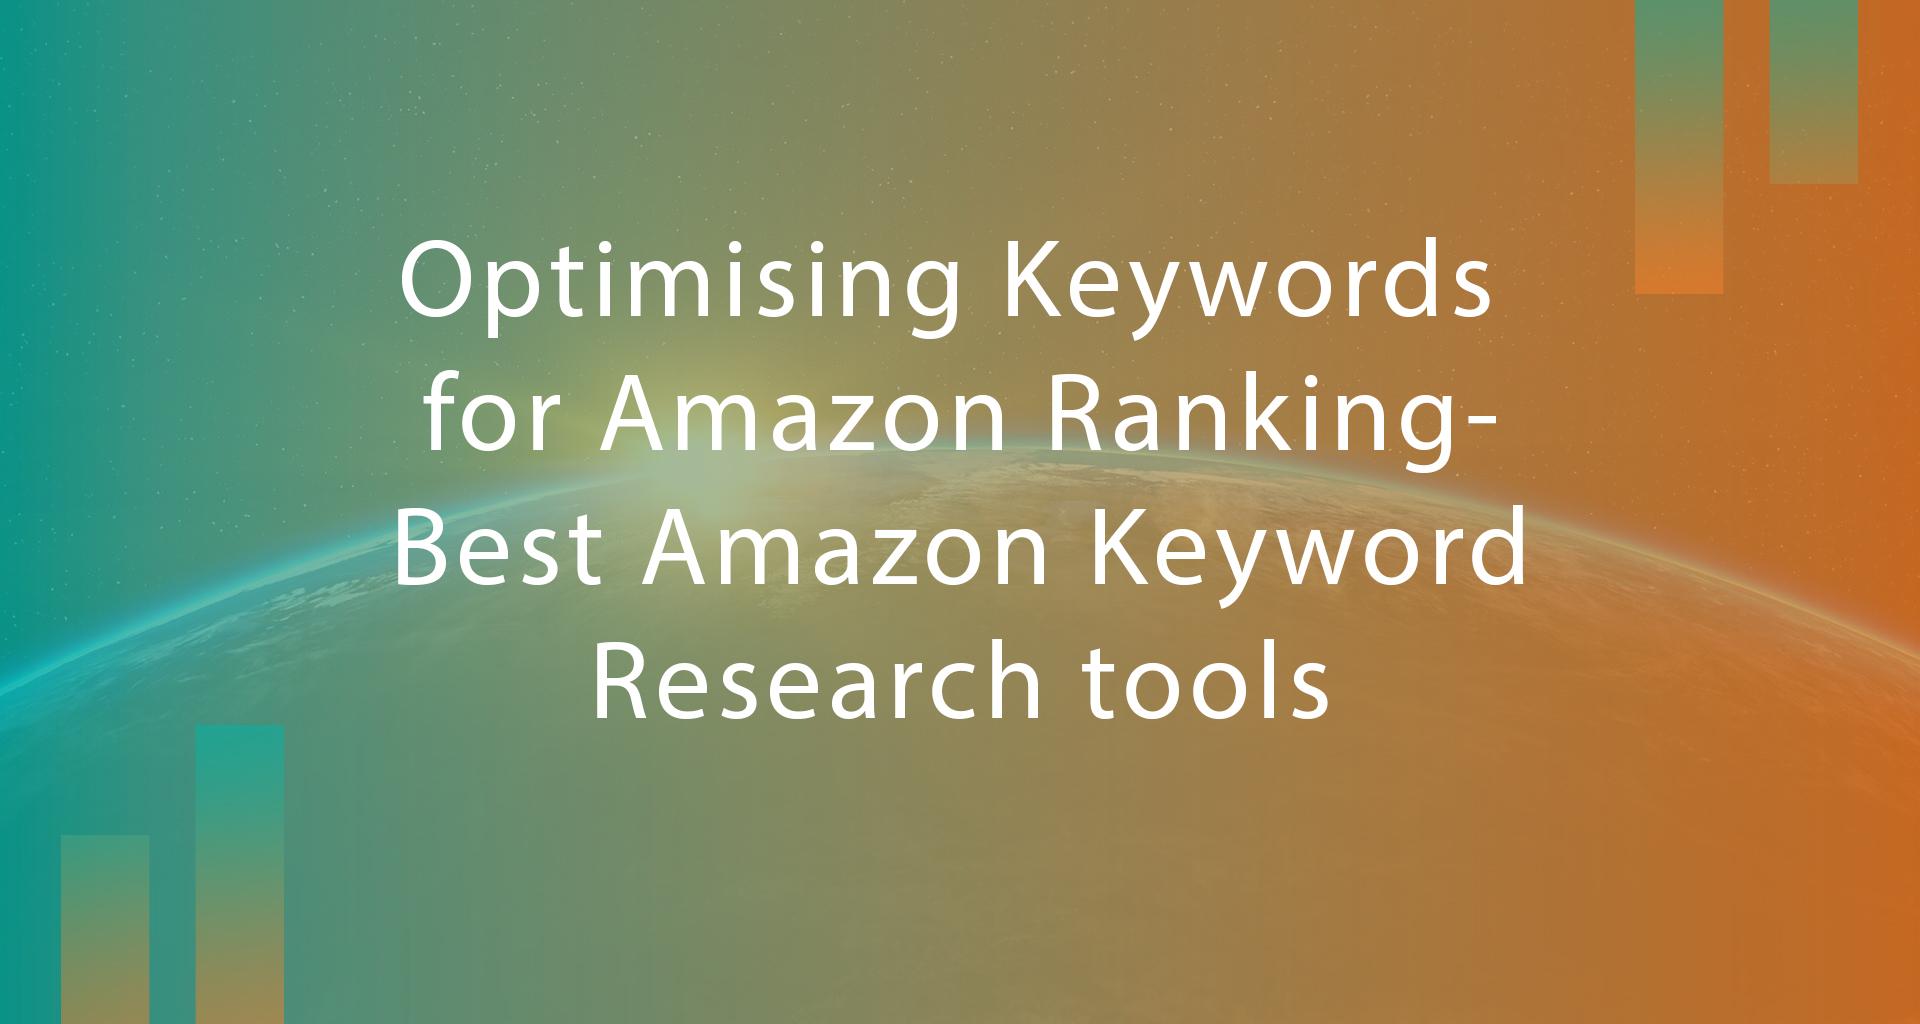 Optimising Keywords for Amazon Ranking- Best Amazon Keyword Research tools